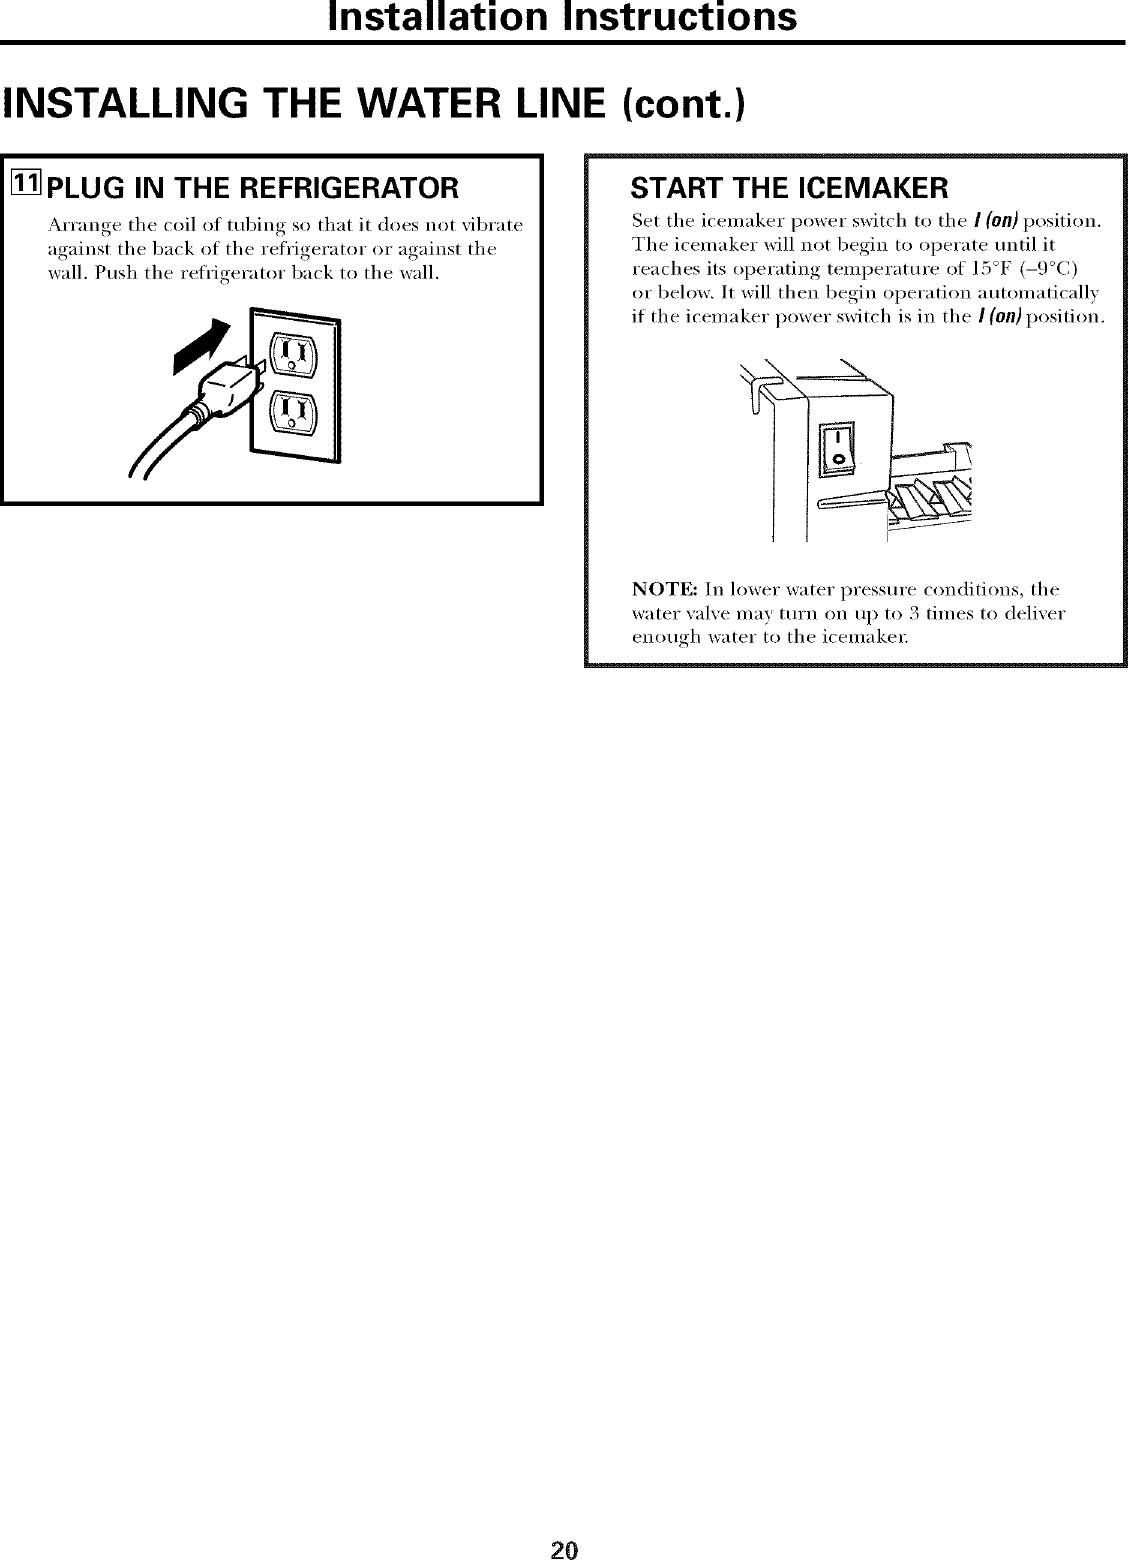 GE Side By Refrigerator Manual L0604478 Ge Gsh Jftabb Refrigerator Wiring Diagram on